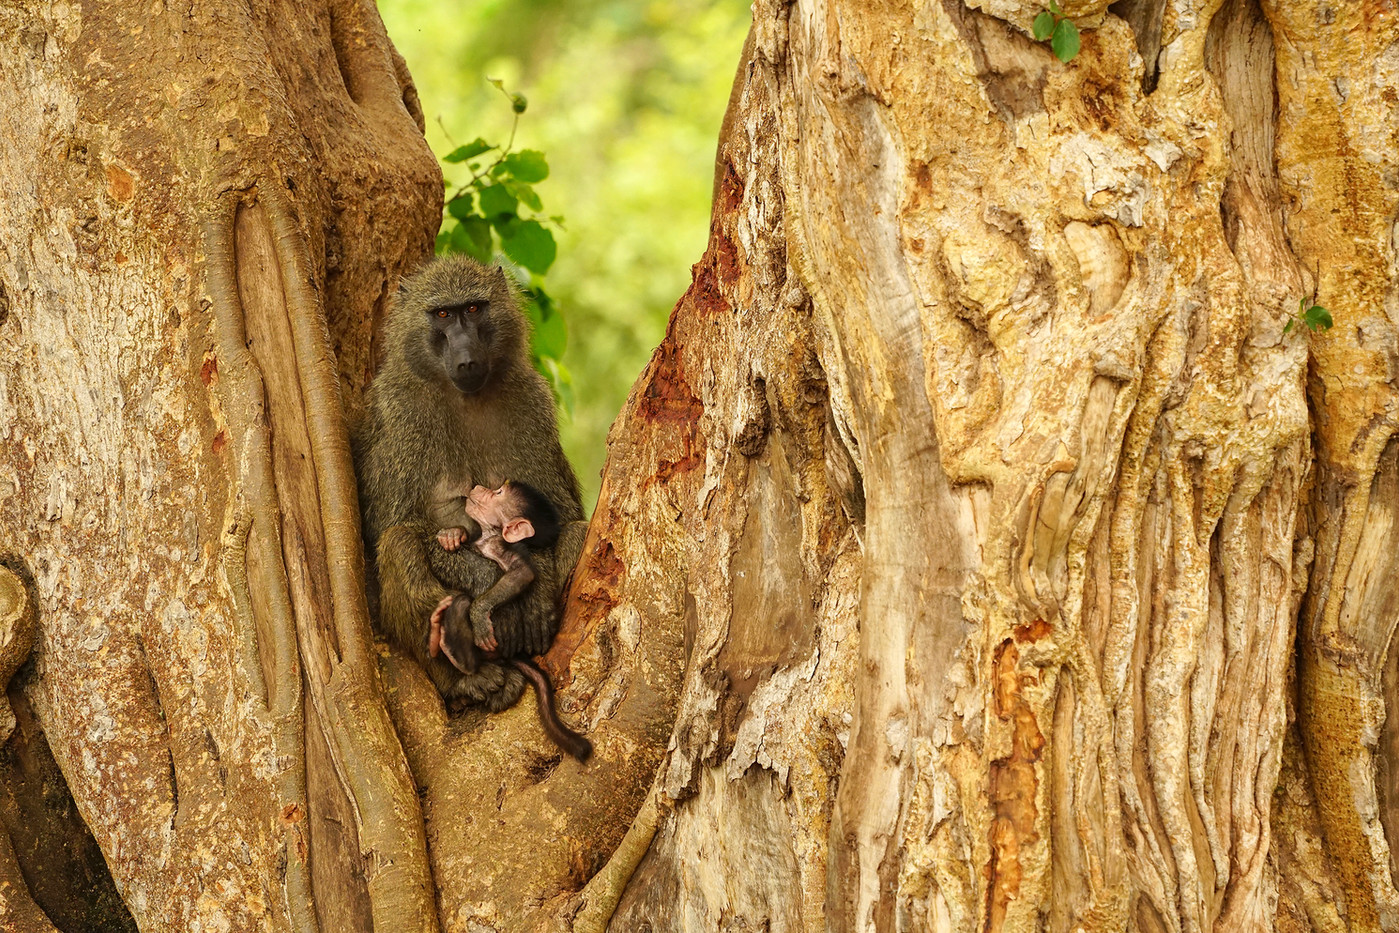 Olive Baboon & baby in Manyara NP, Tanzania